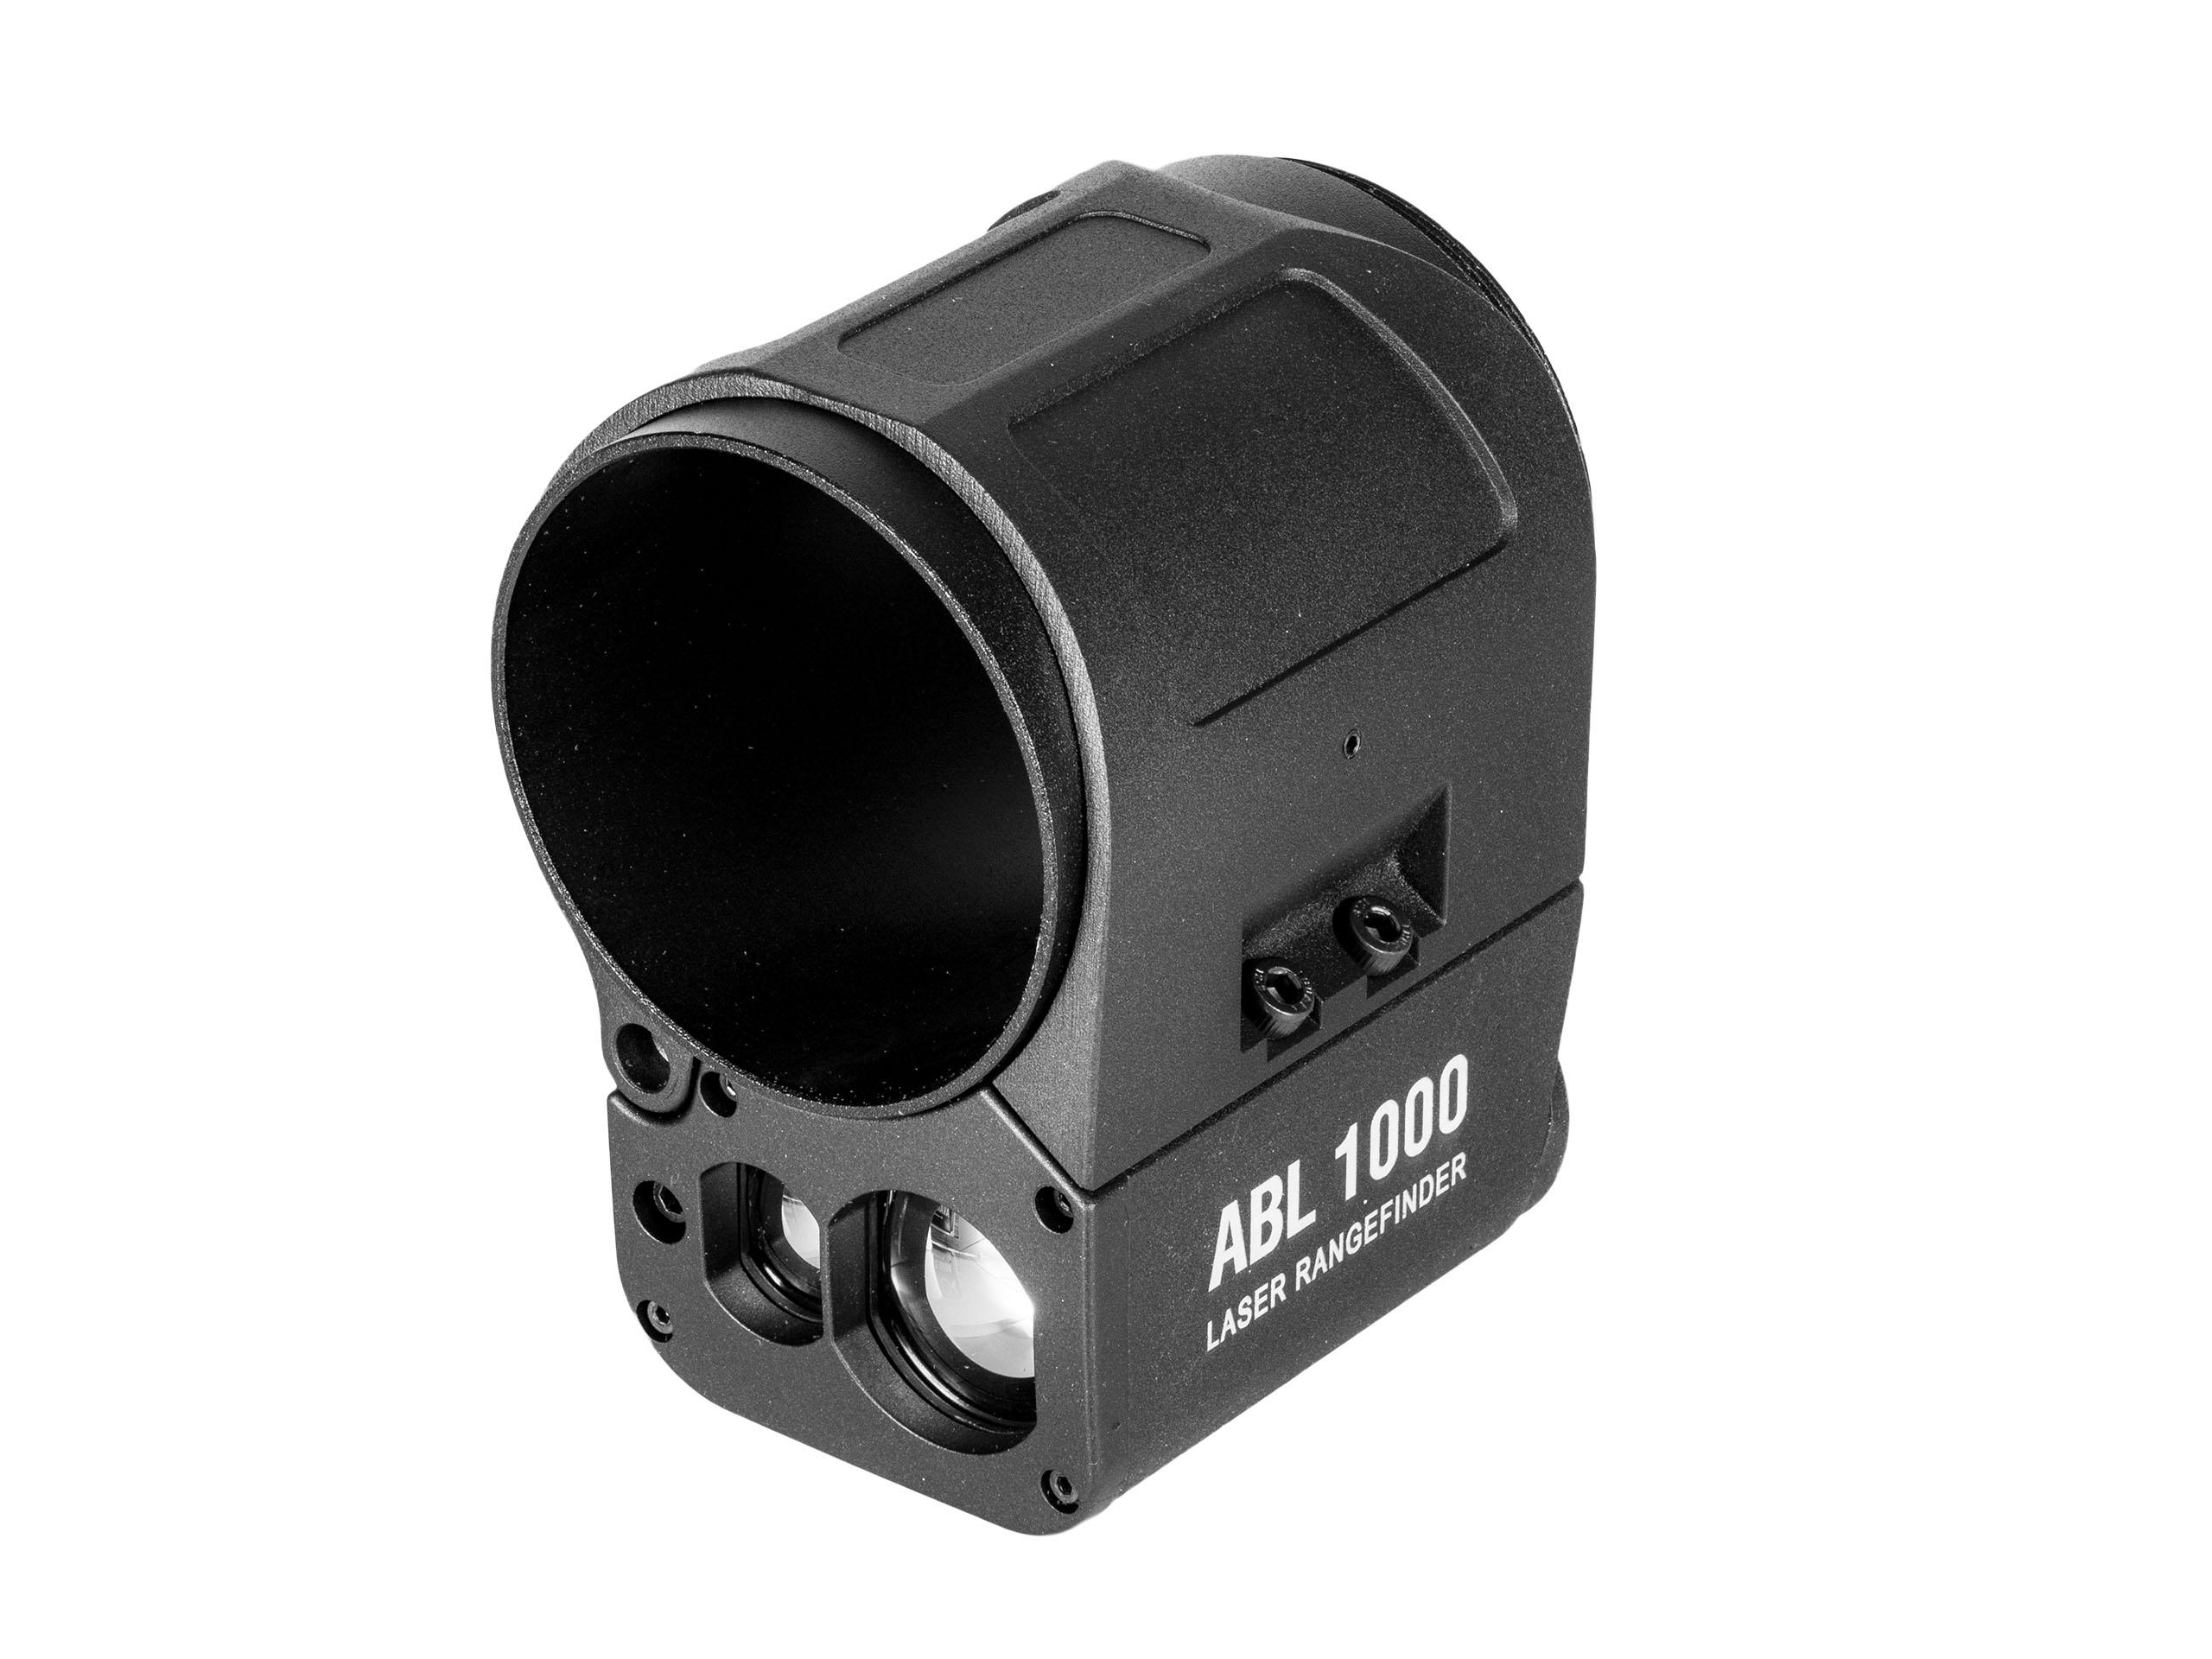 Image of Dalmierz do x-sight atn smart rangefinder 1000 m (006-034)